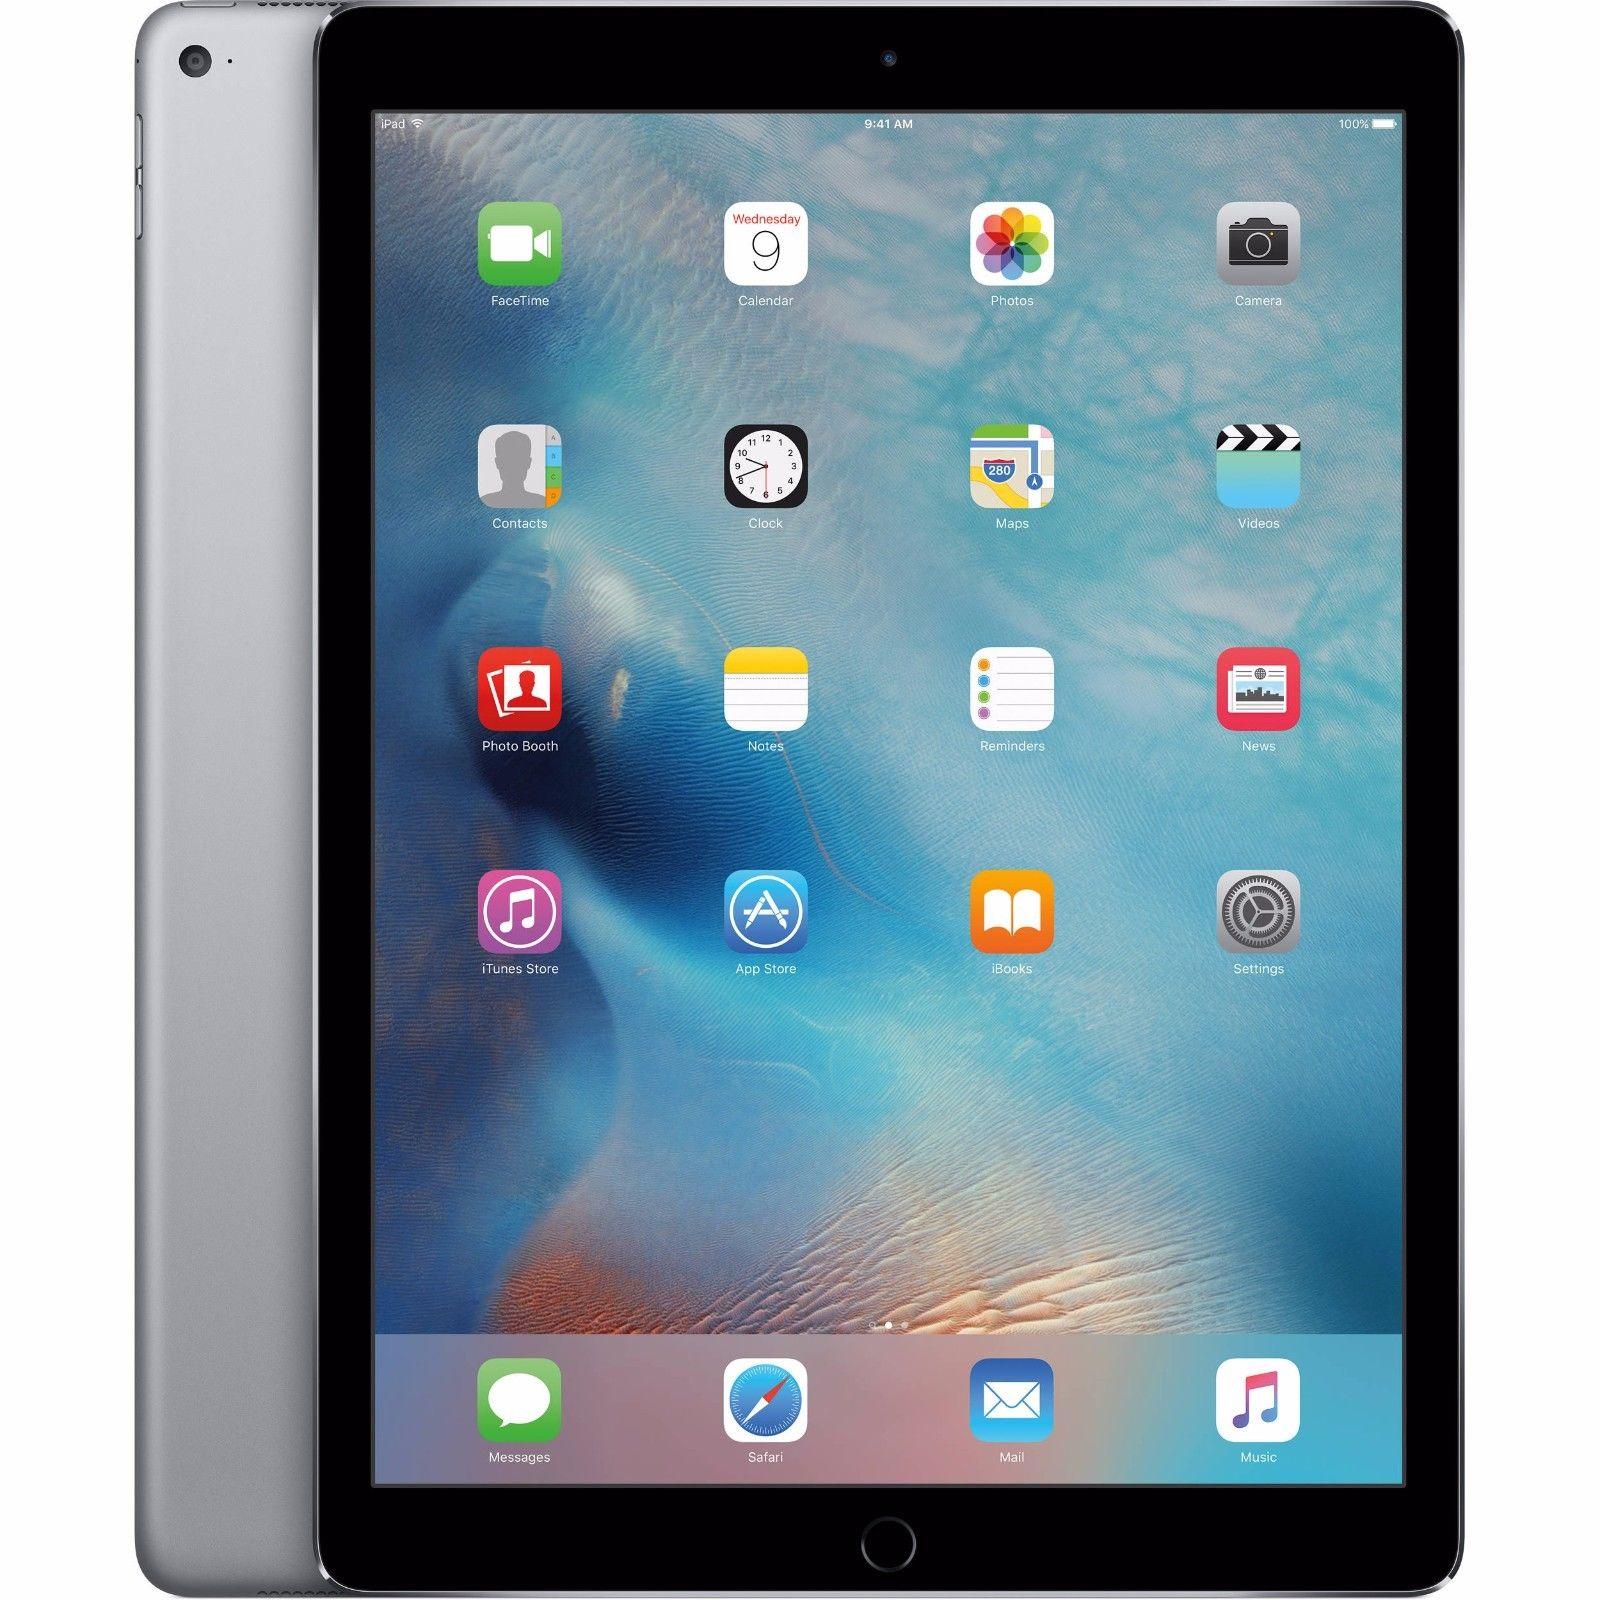 Apple iPad 5th Gen 32GB 128GB Wifi + Cellular Unlocked - Space Gray Silver Gold